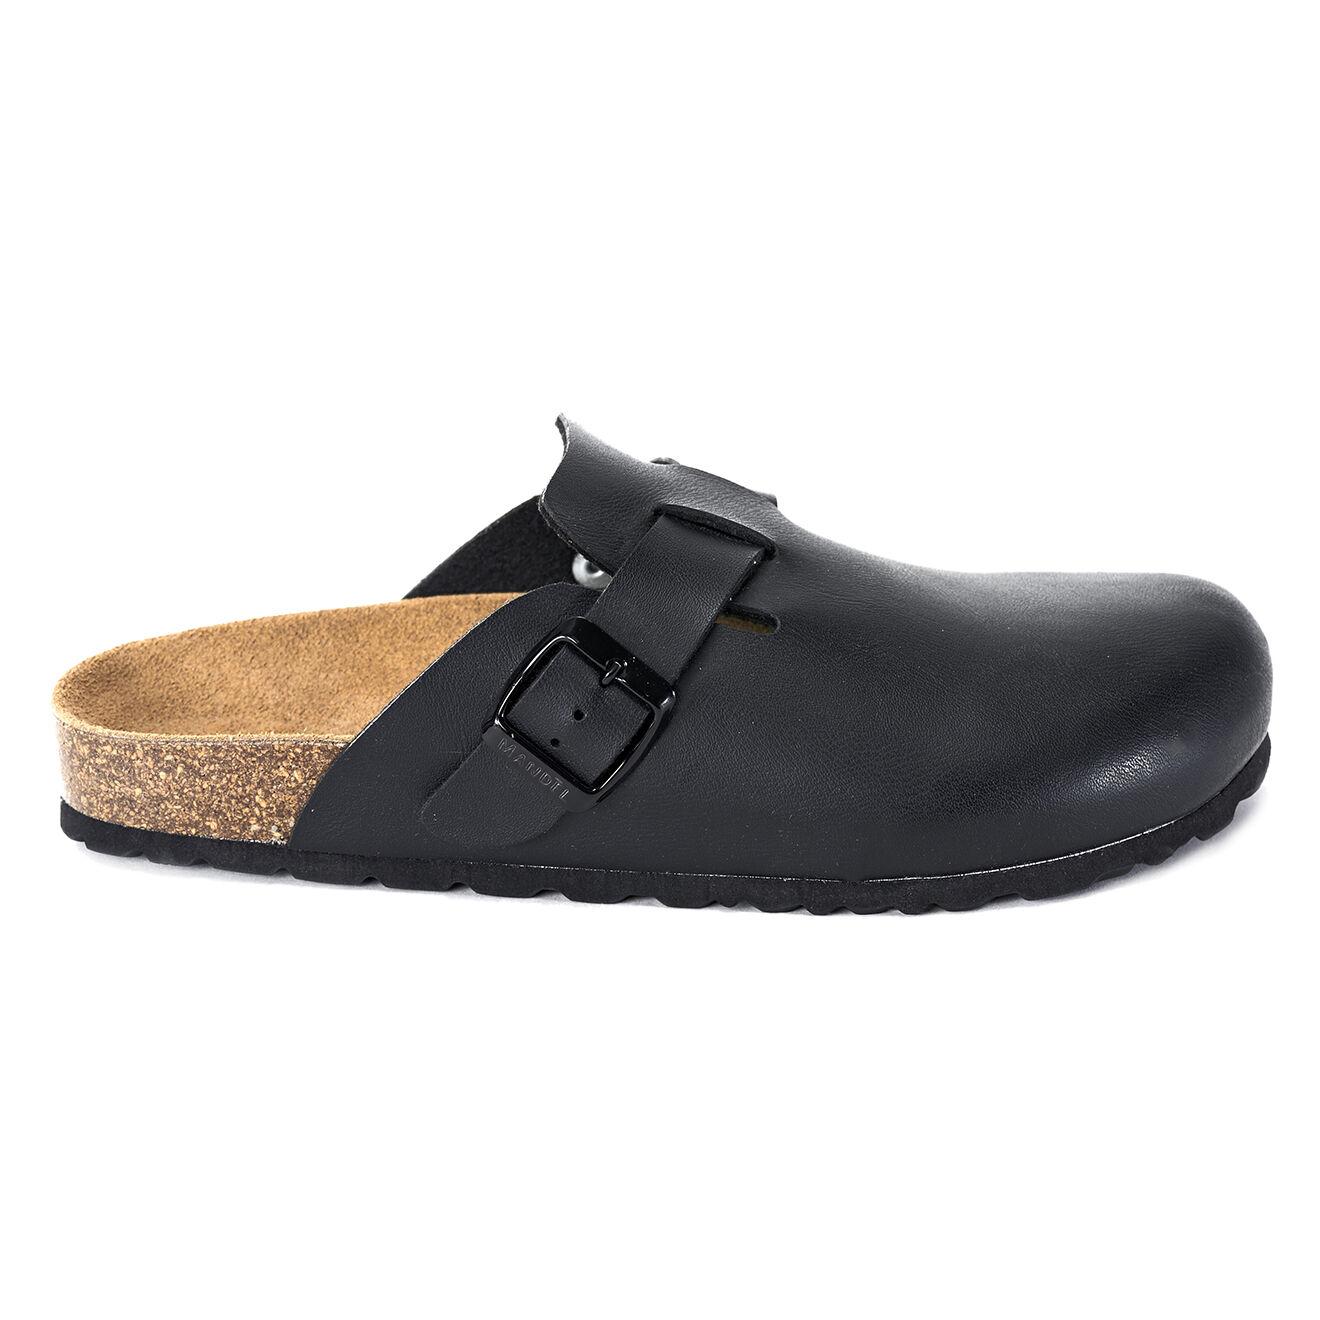 Sabots en Eco cuir Noe noirs - Mandèl - Modalova